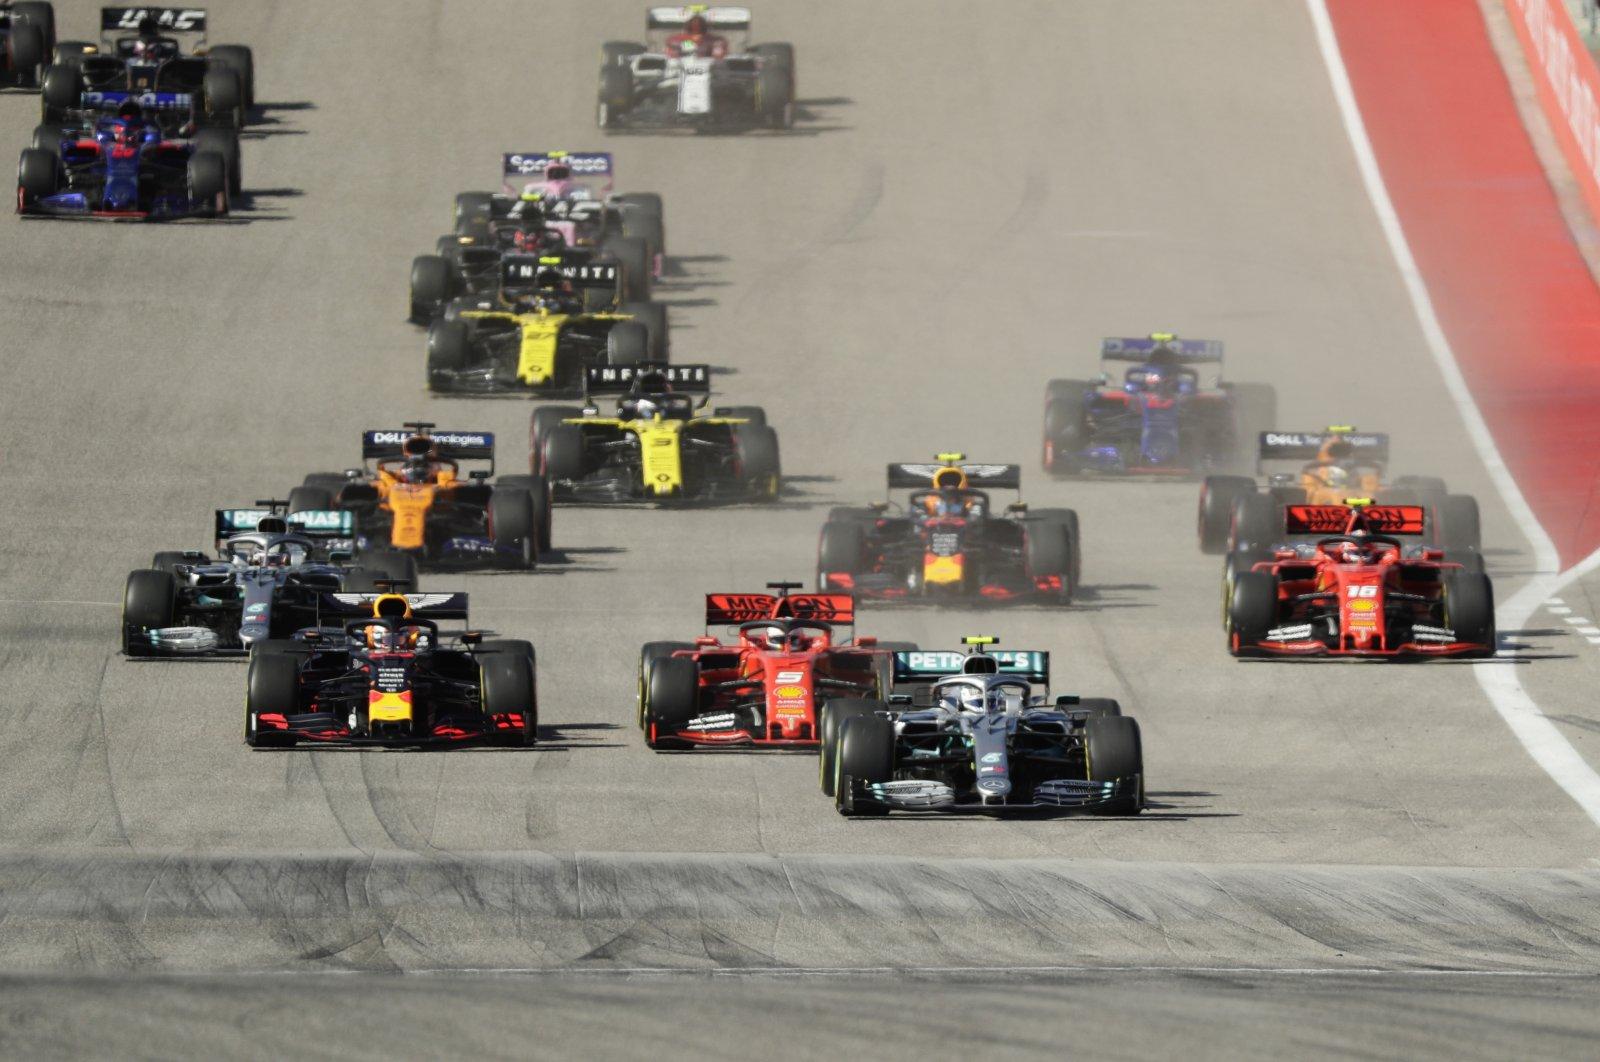 Mercedes driver Valtteri Bottas leads the field at the start of the Formula One U.S. Grand Prix in Austin, Texas, U.S., Nov. 3, 2019. (AP Photo)